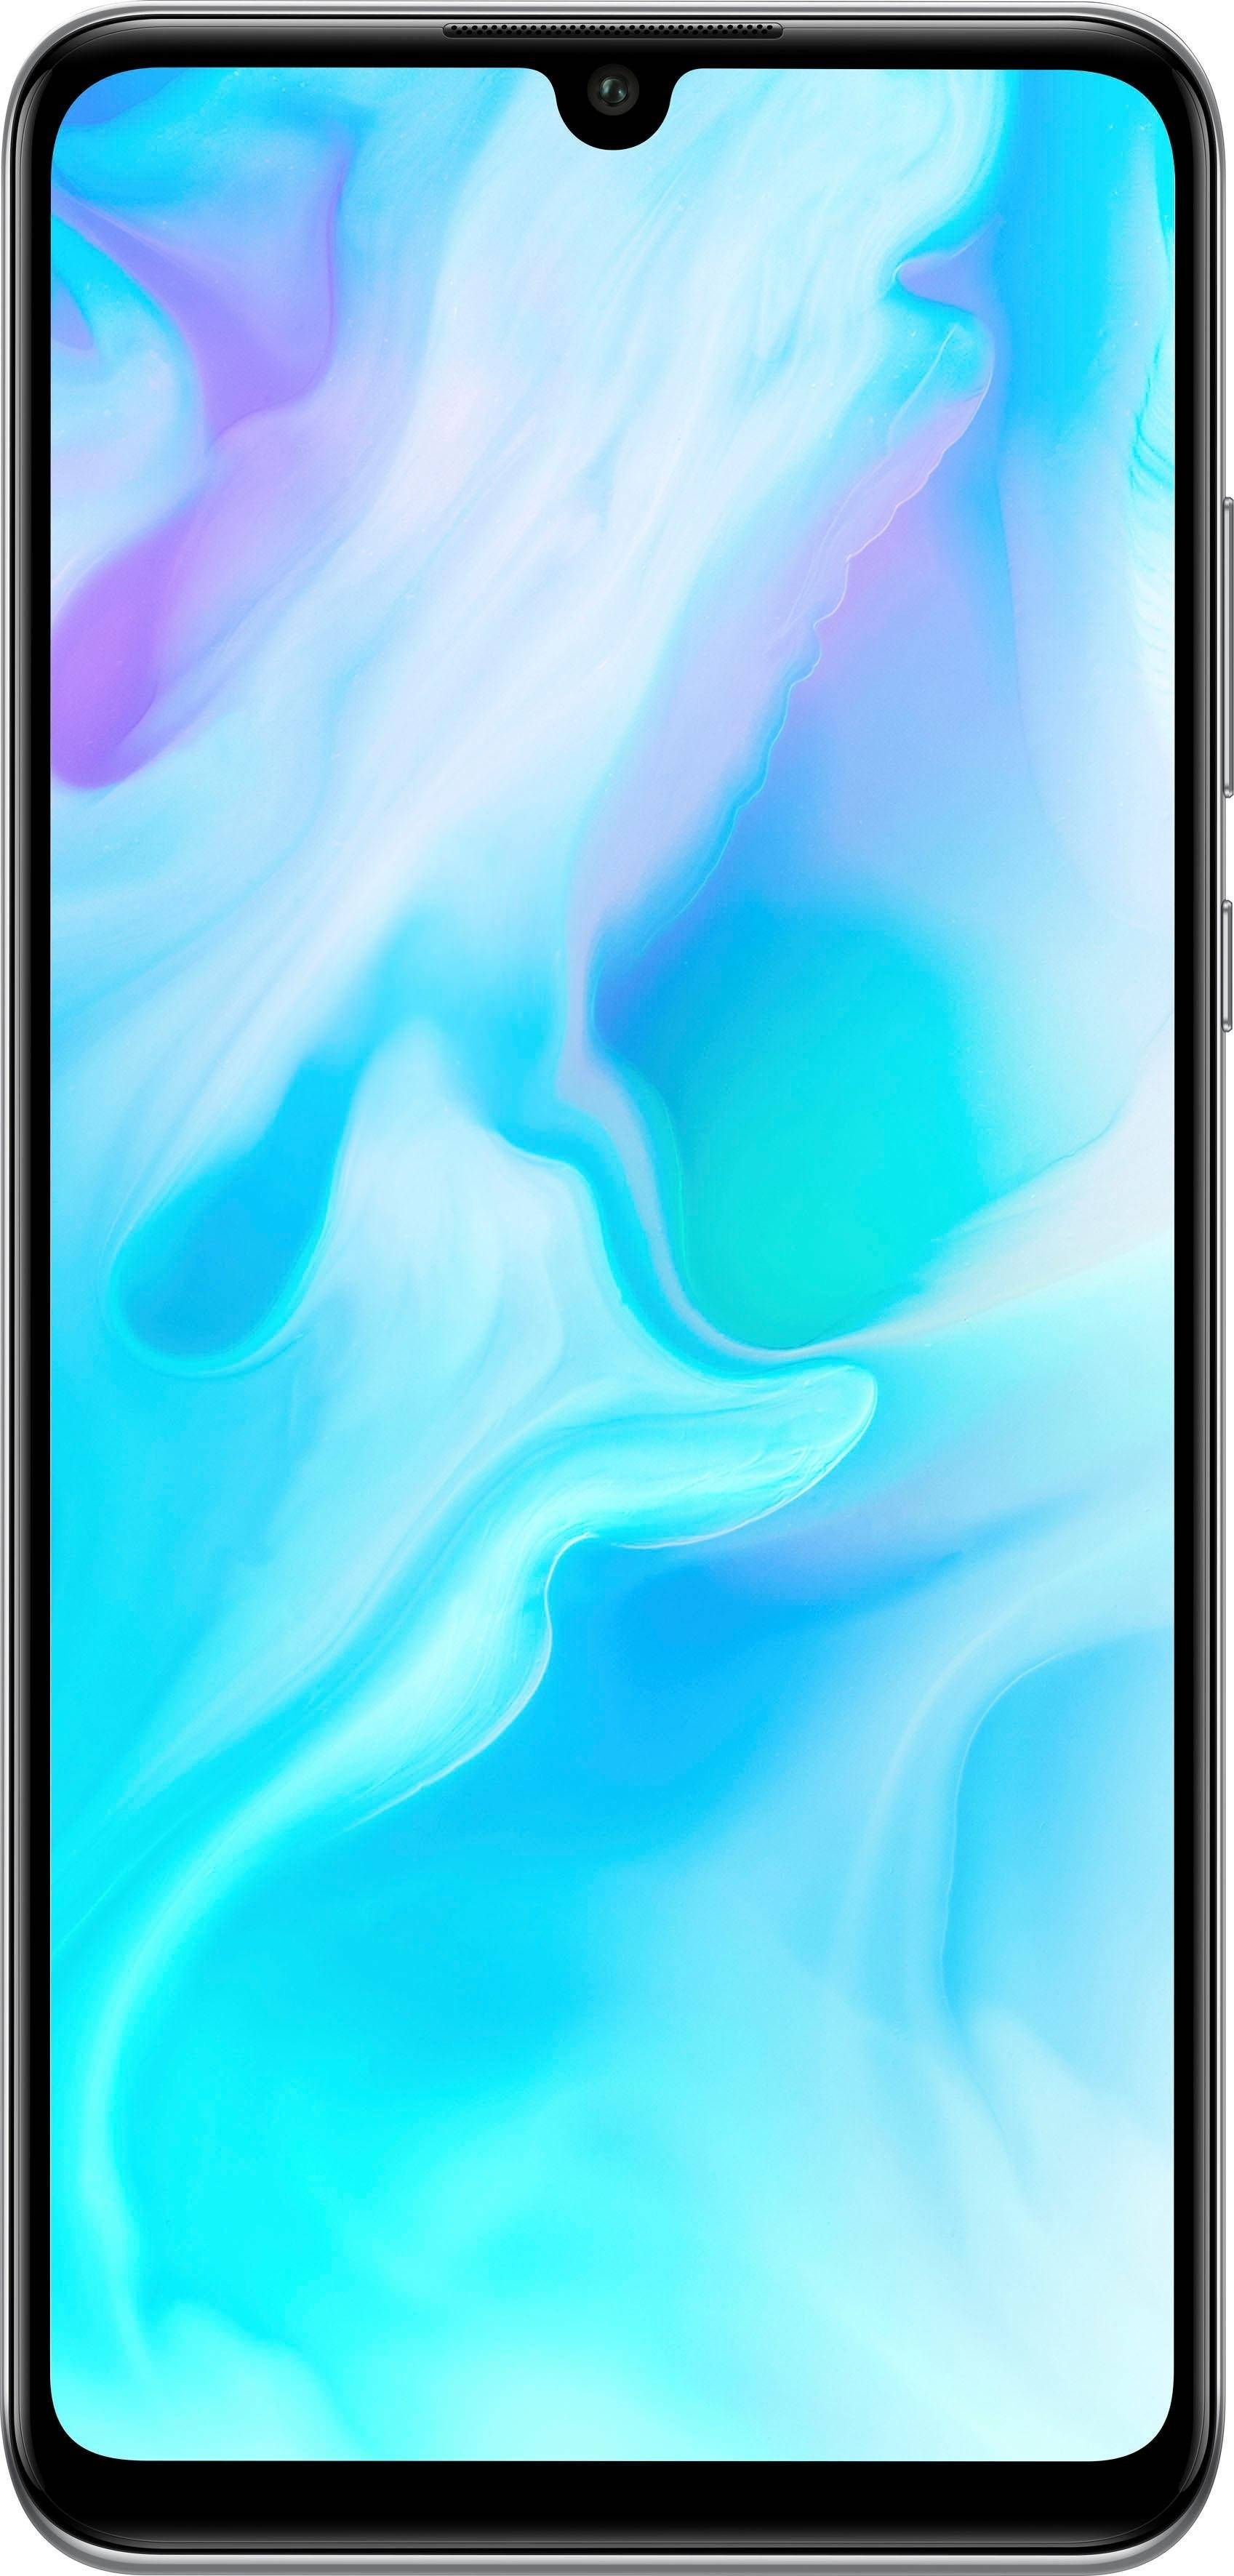 Huawei P30 lite Smartphone (15,62 cm/6,1 Zoll, 128 GB Speicherplatz, 48 MP Kamera), pearl white